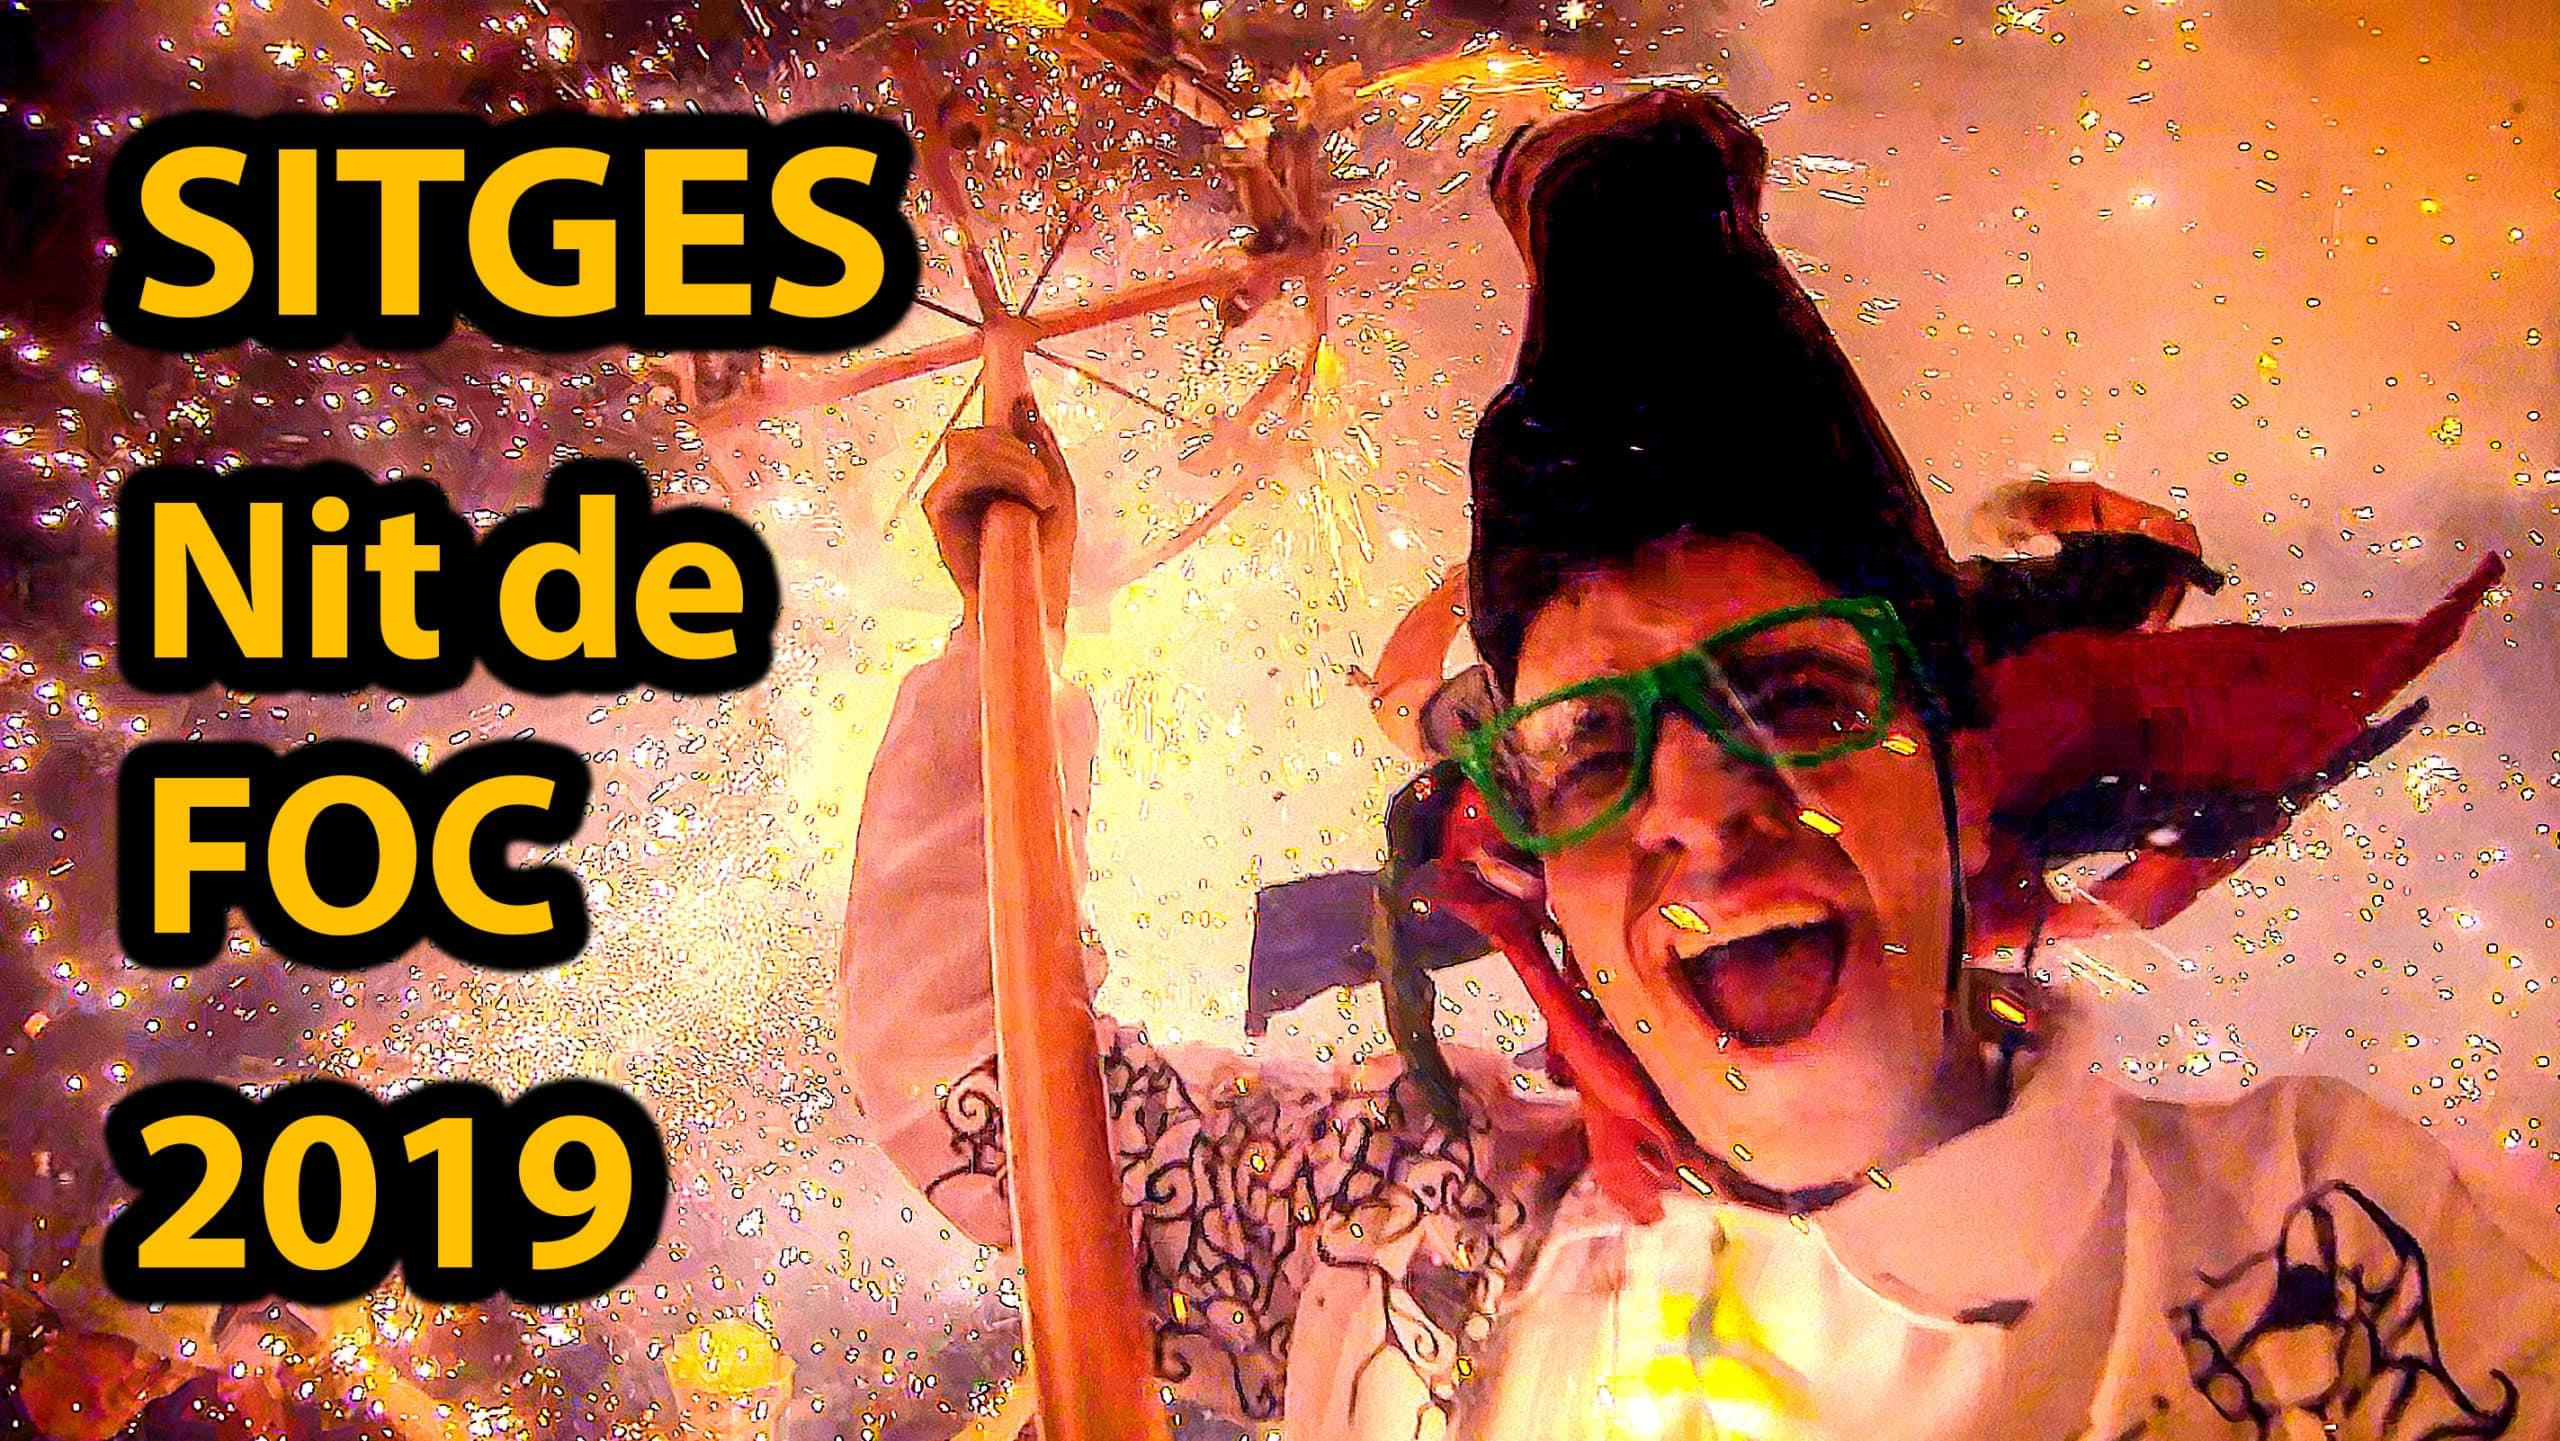 VIDEO: Nit de Foc 2019 en Sitges